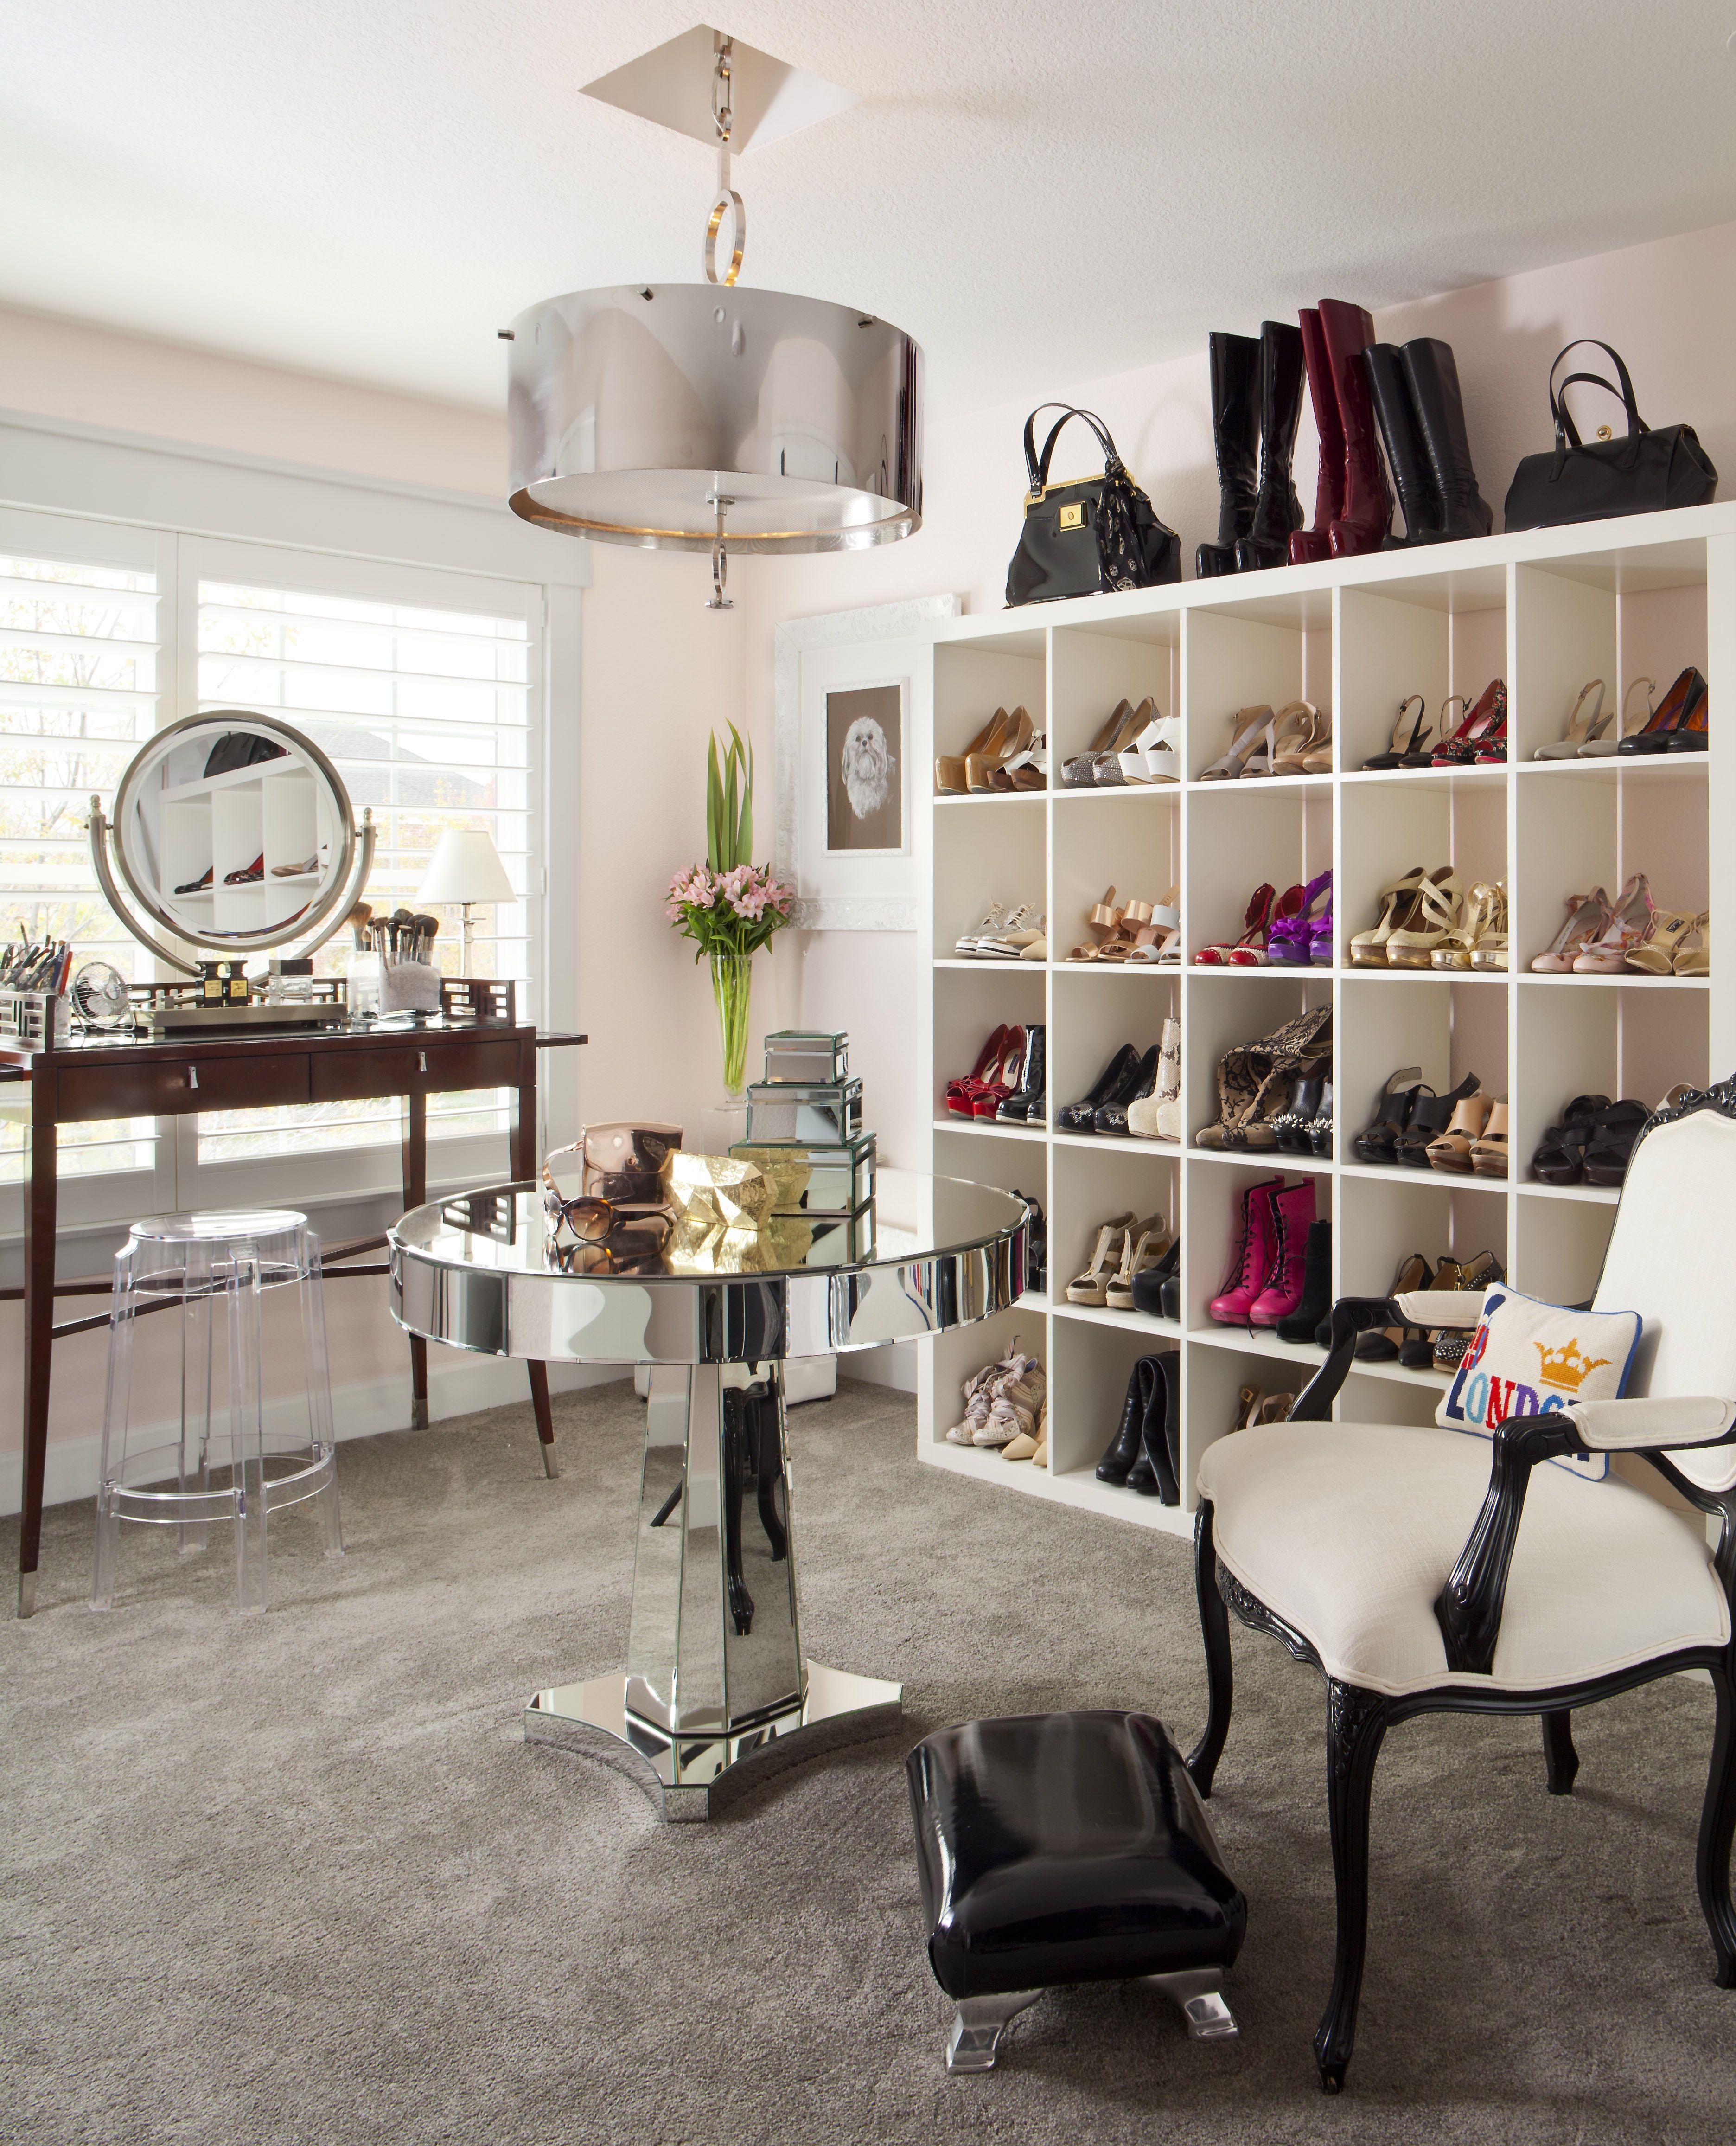 Best Hintgen Residence By Dh Interiors Inc Closet Designs 400 x 300